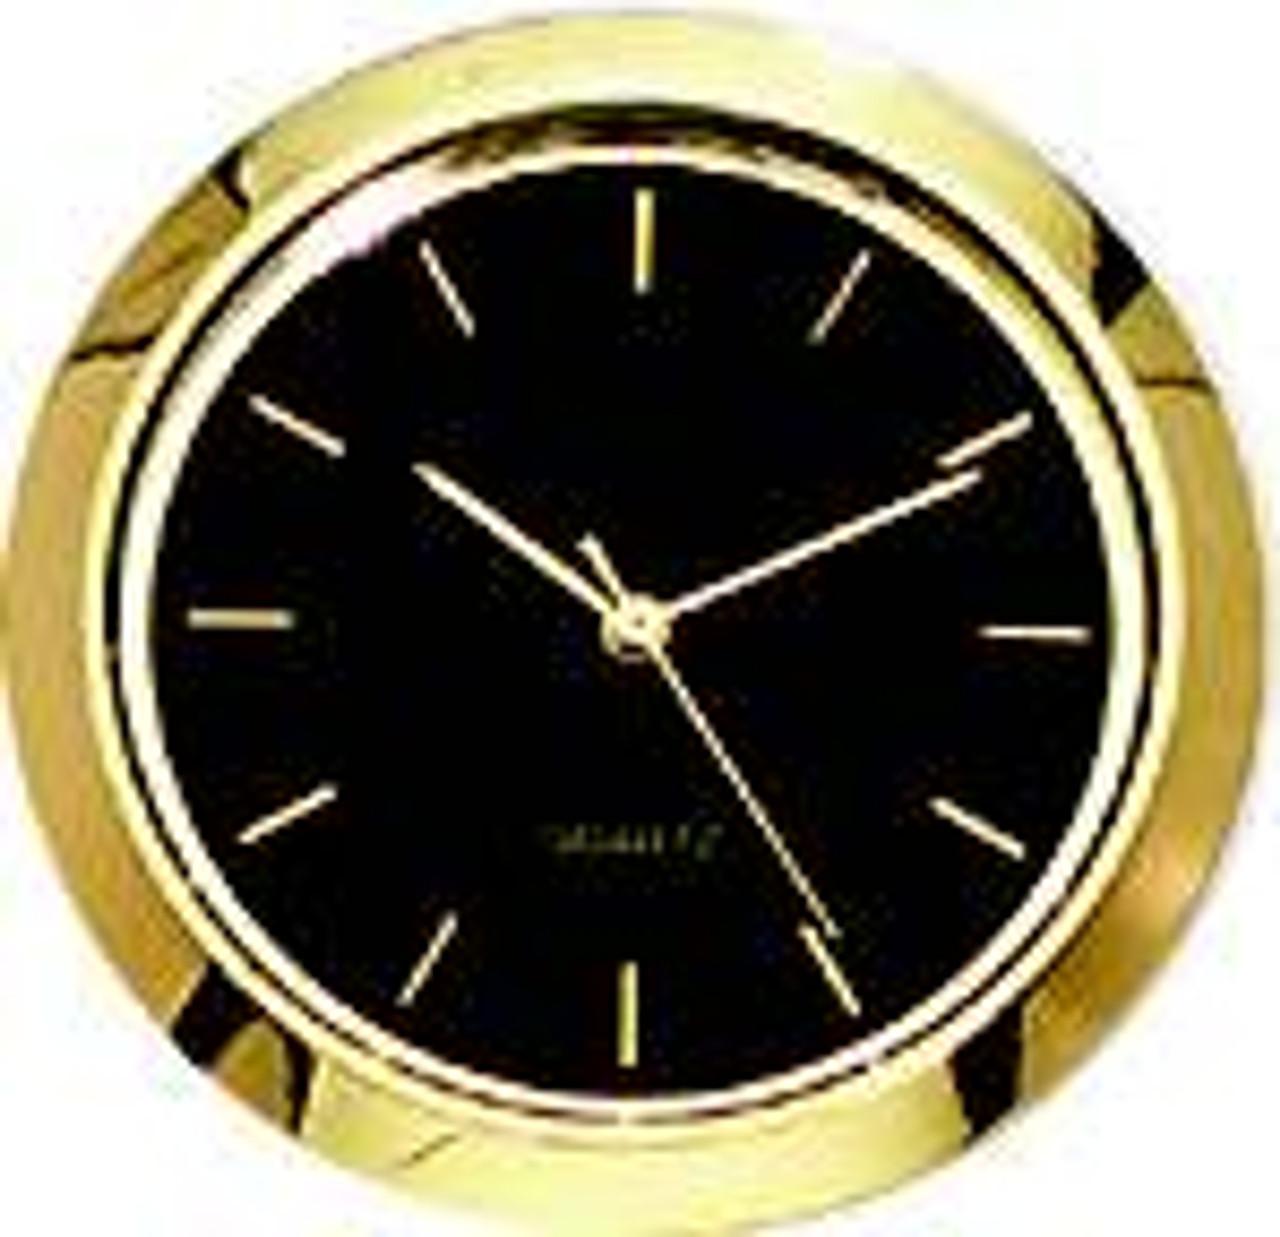 Black Face Marker 1 7/16 (36mm) Glass Lens Clock Insert/Fit Up